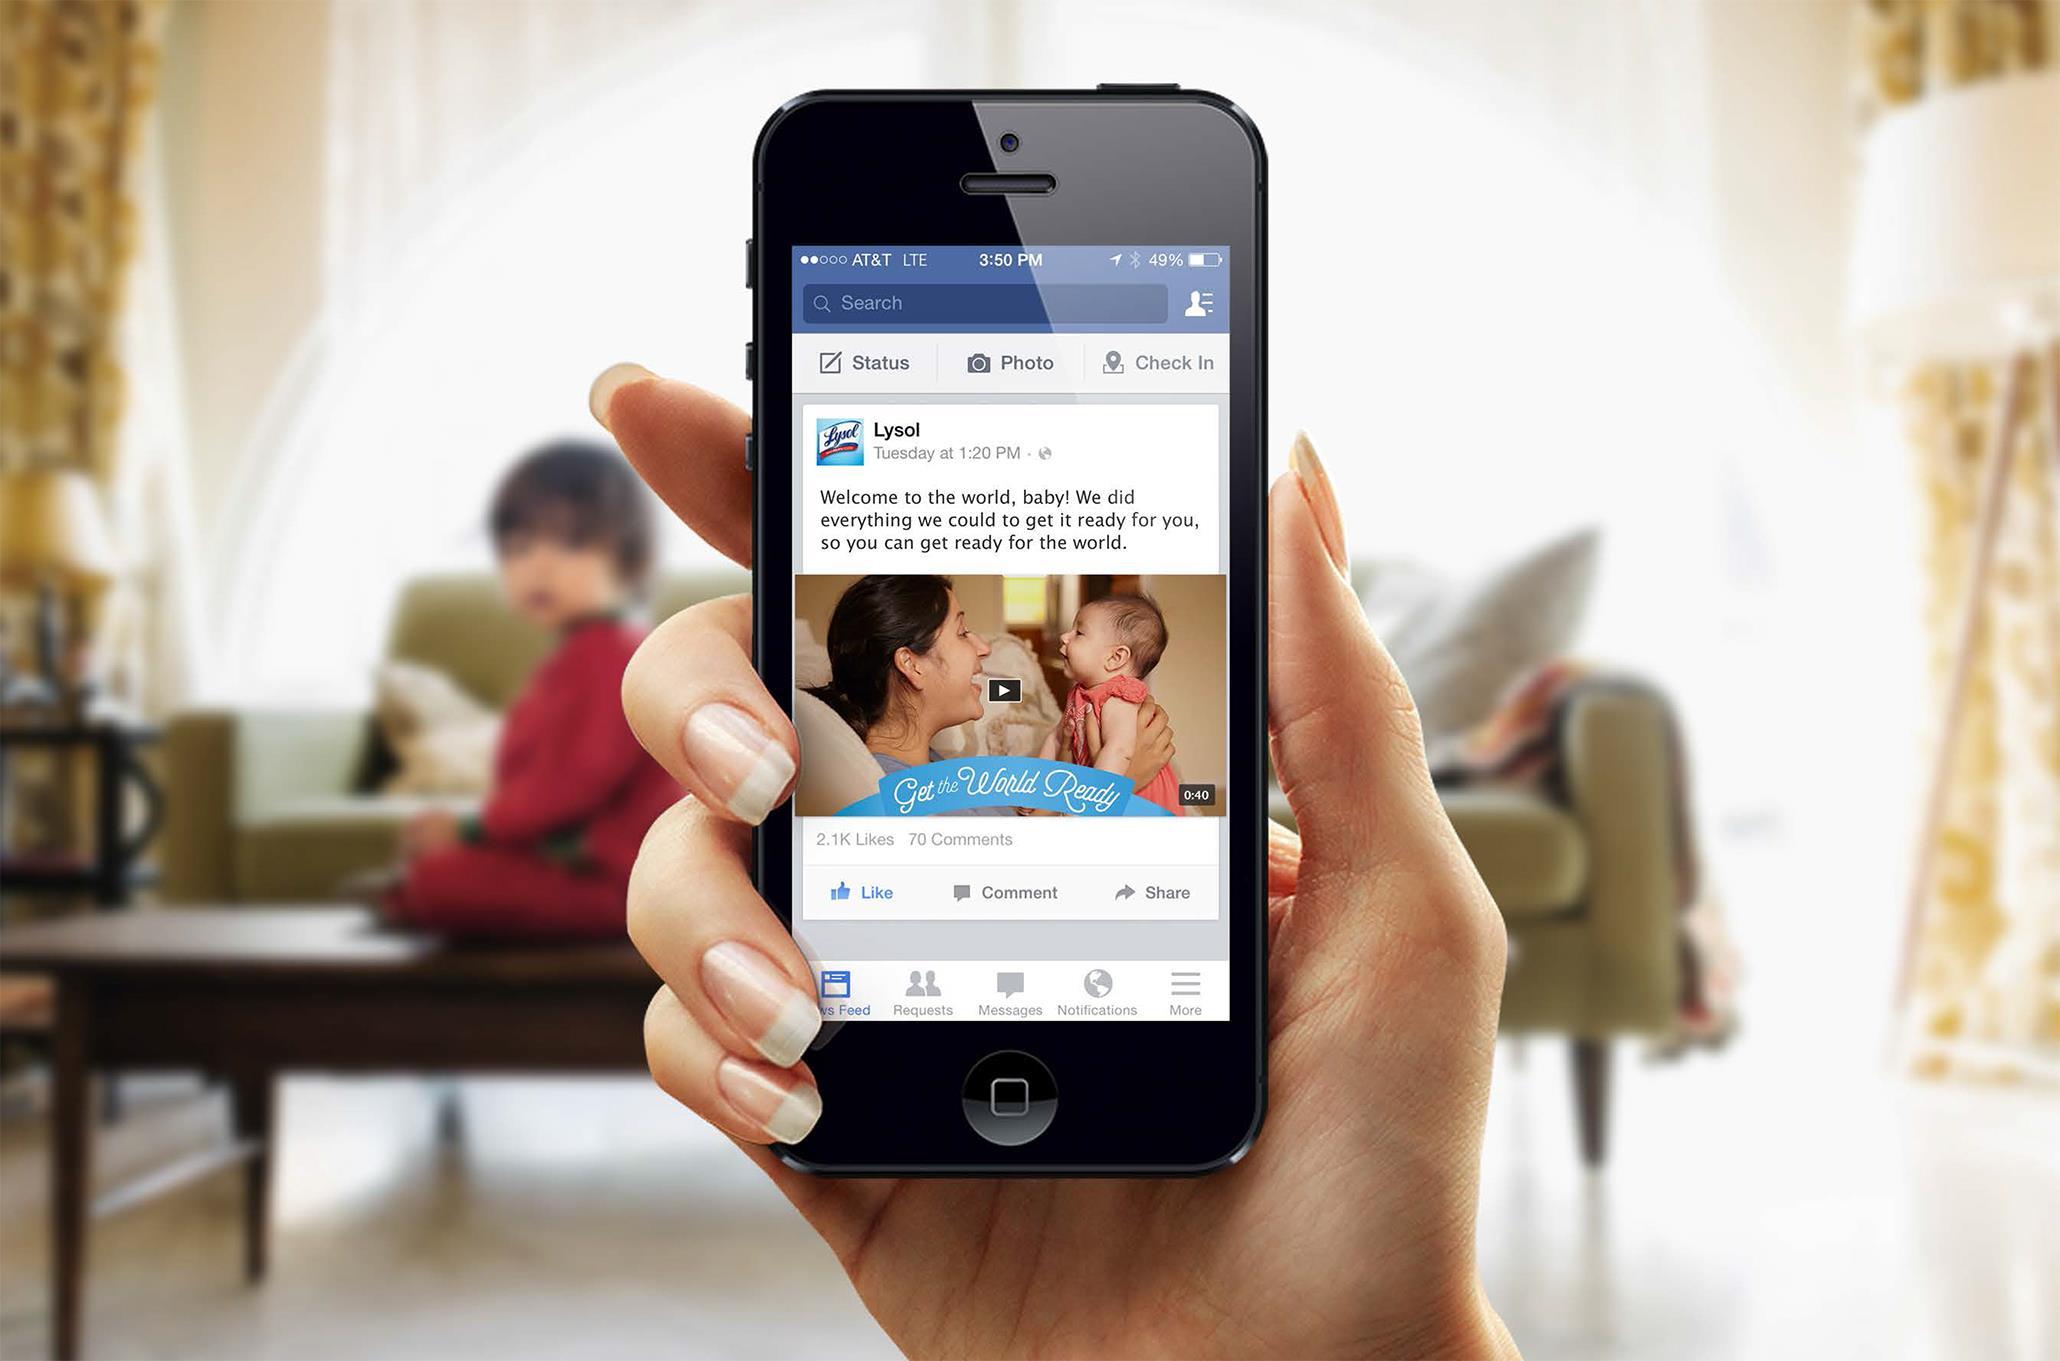 Lysol New Moms: Dear Baby Facebook Campaign